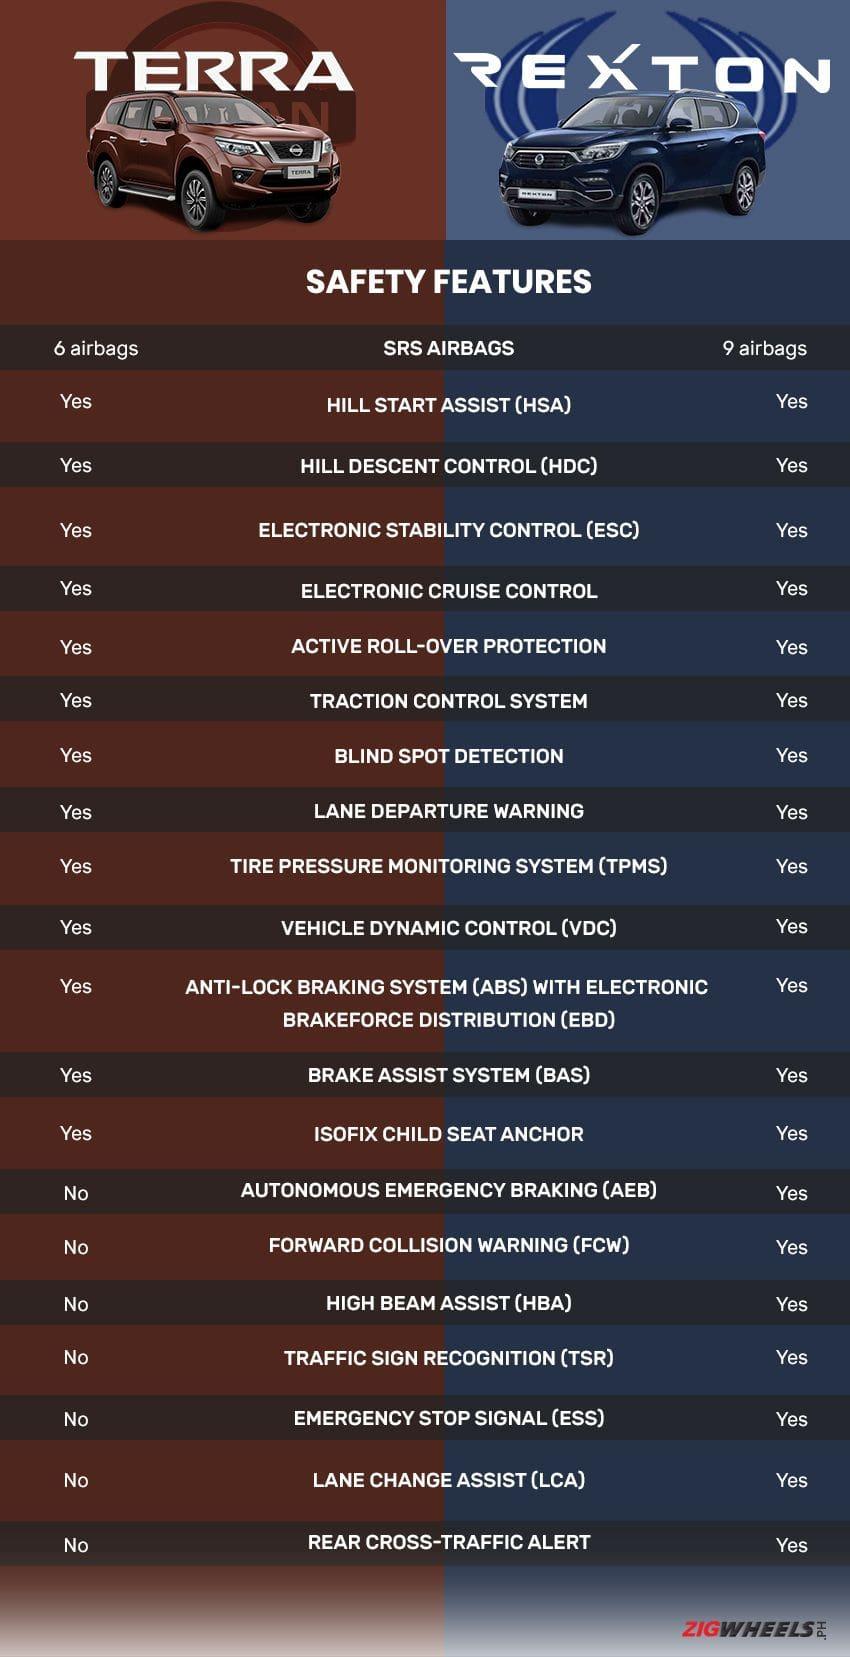 Nissan Terra safety vs SsangYong Rexton safety